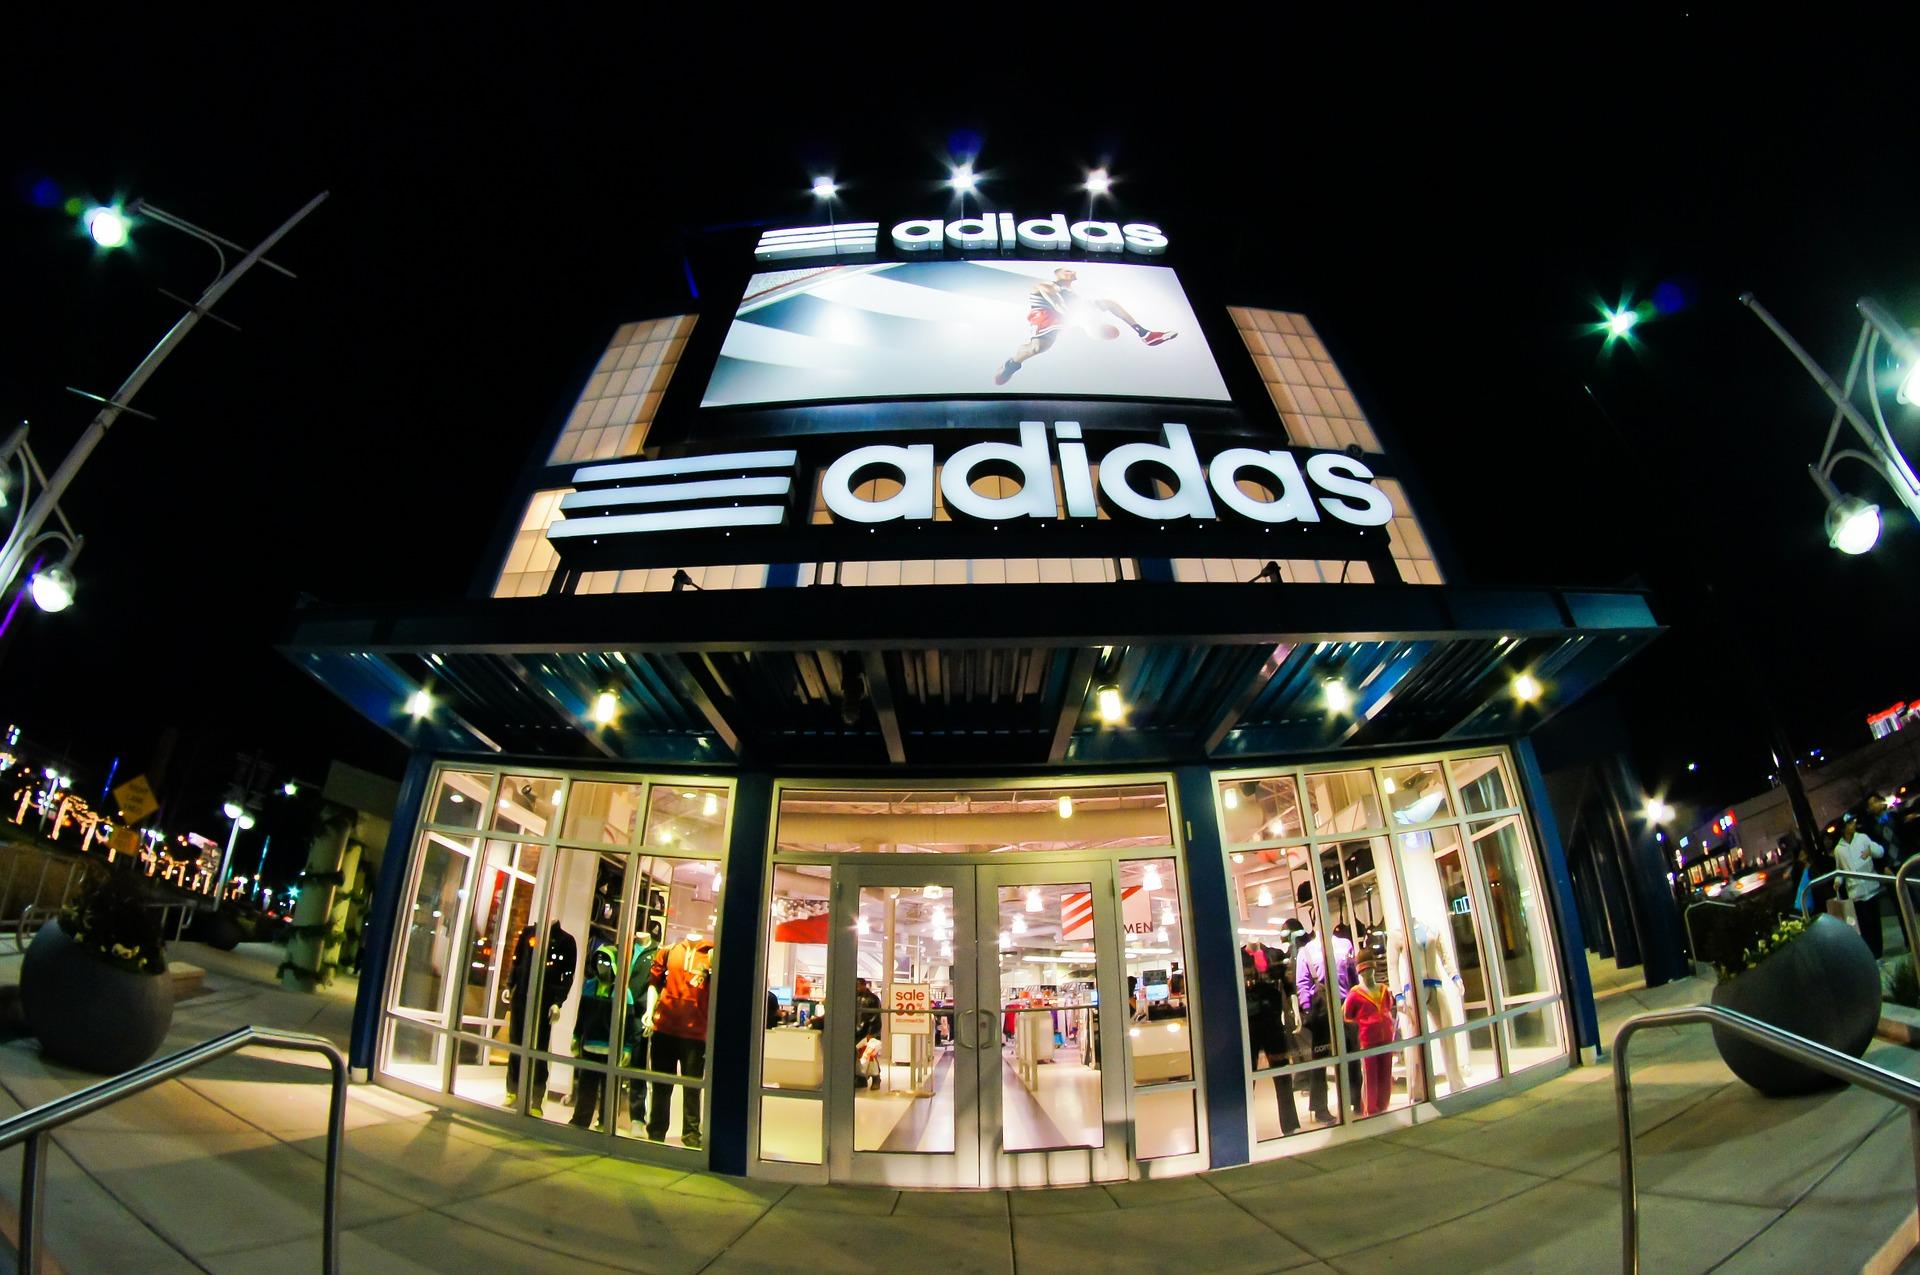 laden_adidas_amerika